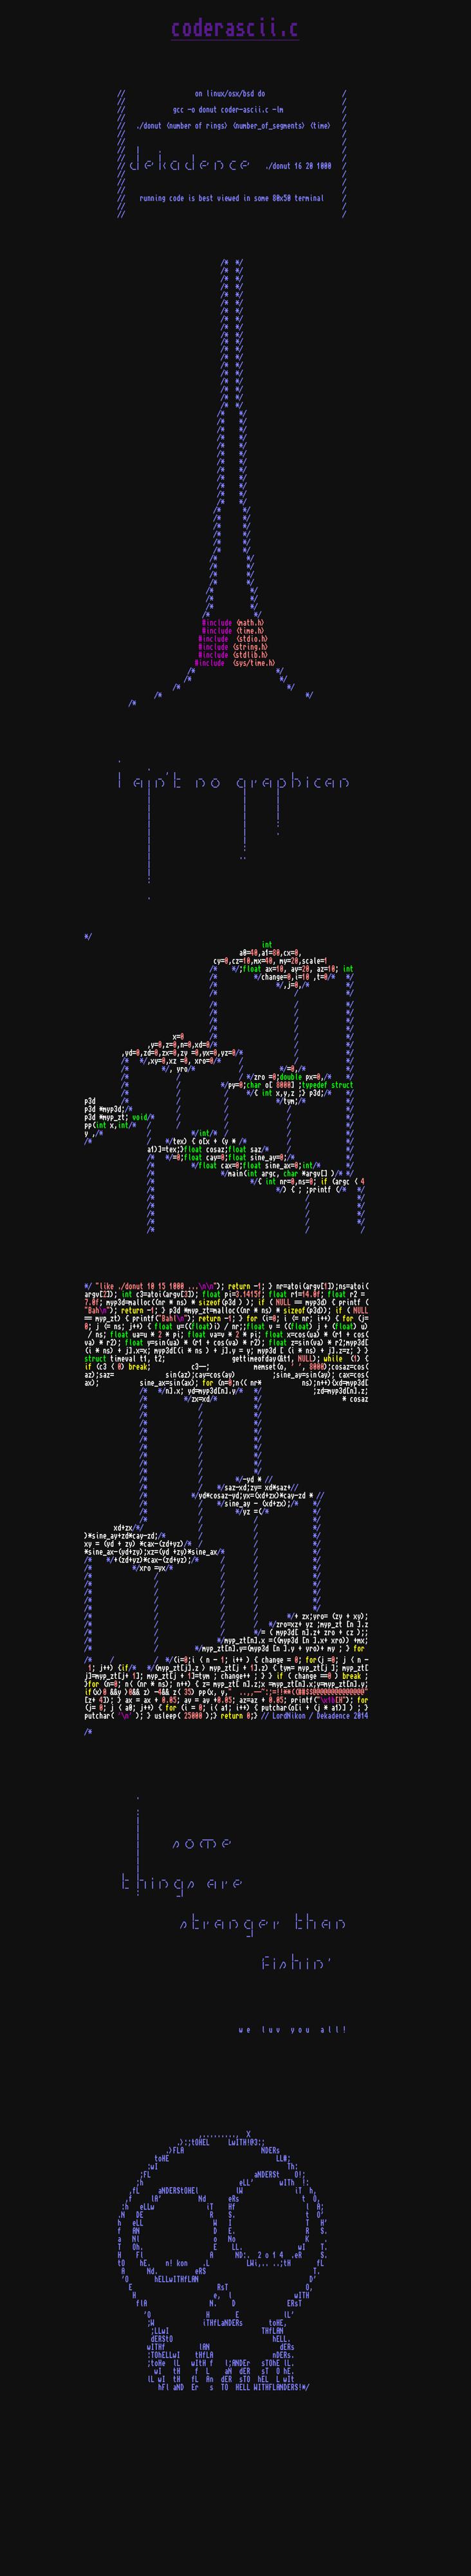 lord nikon_smaller